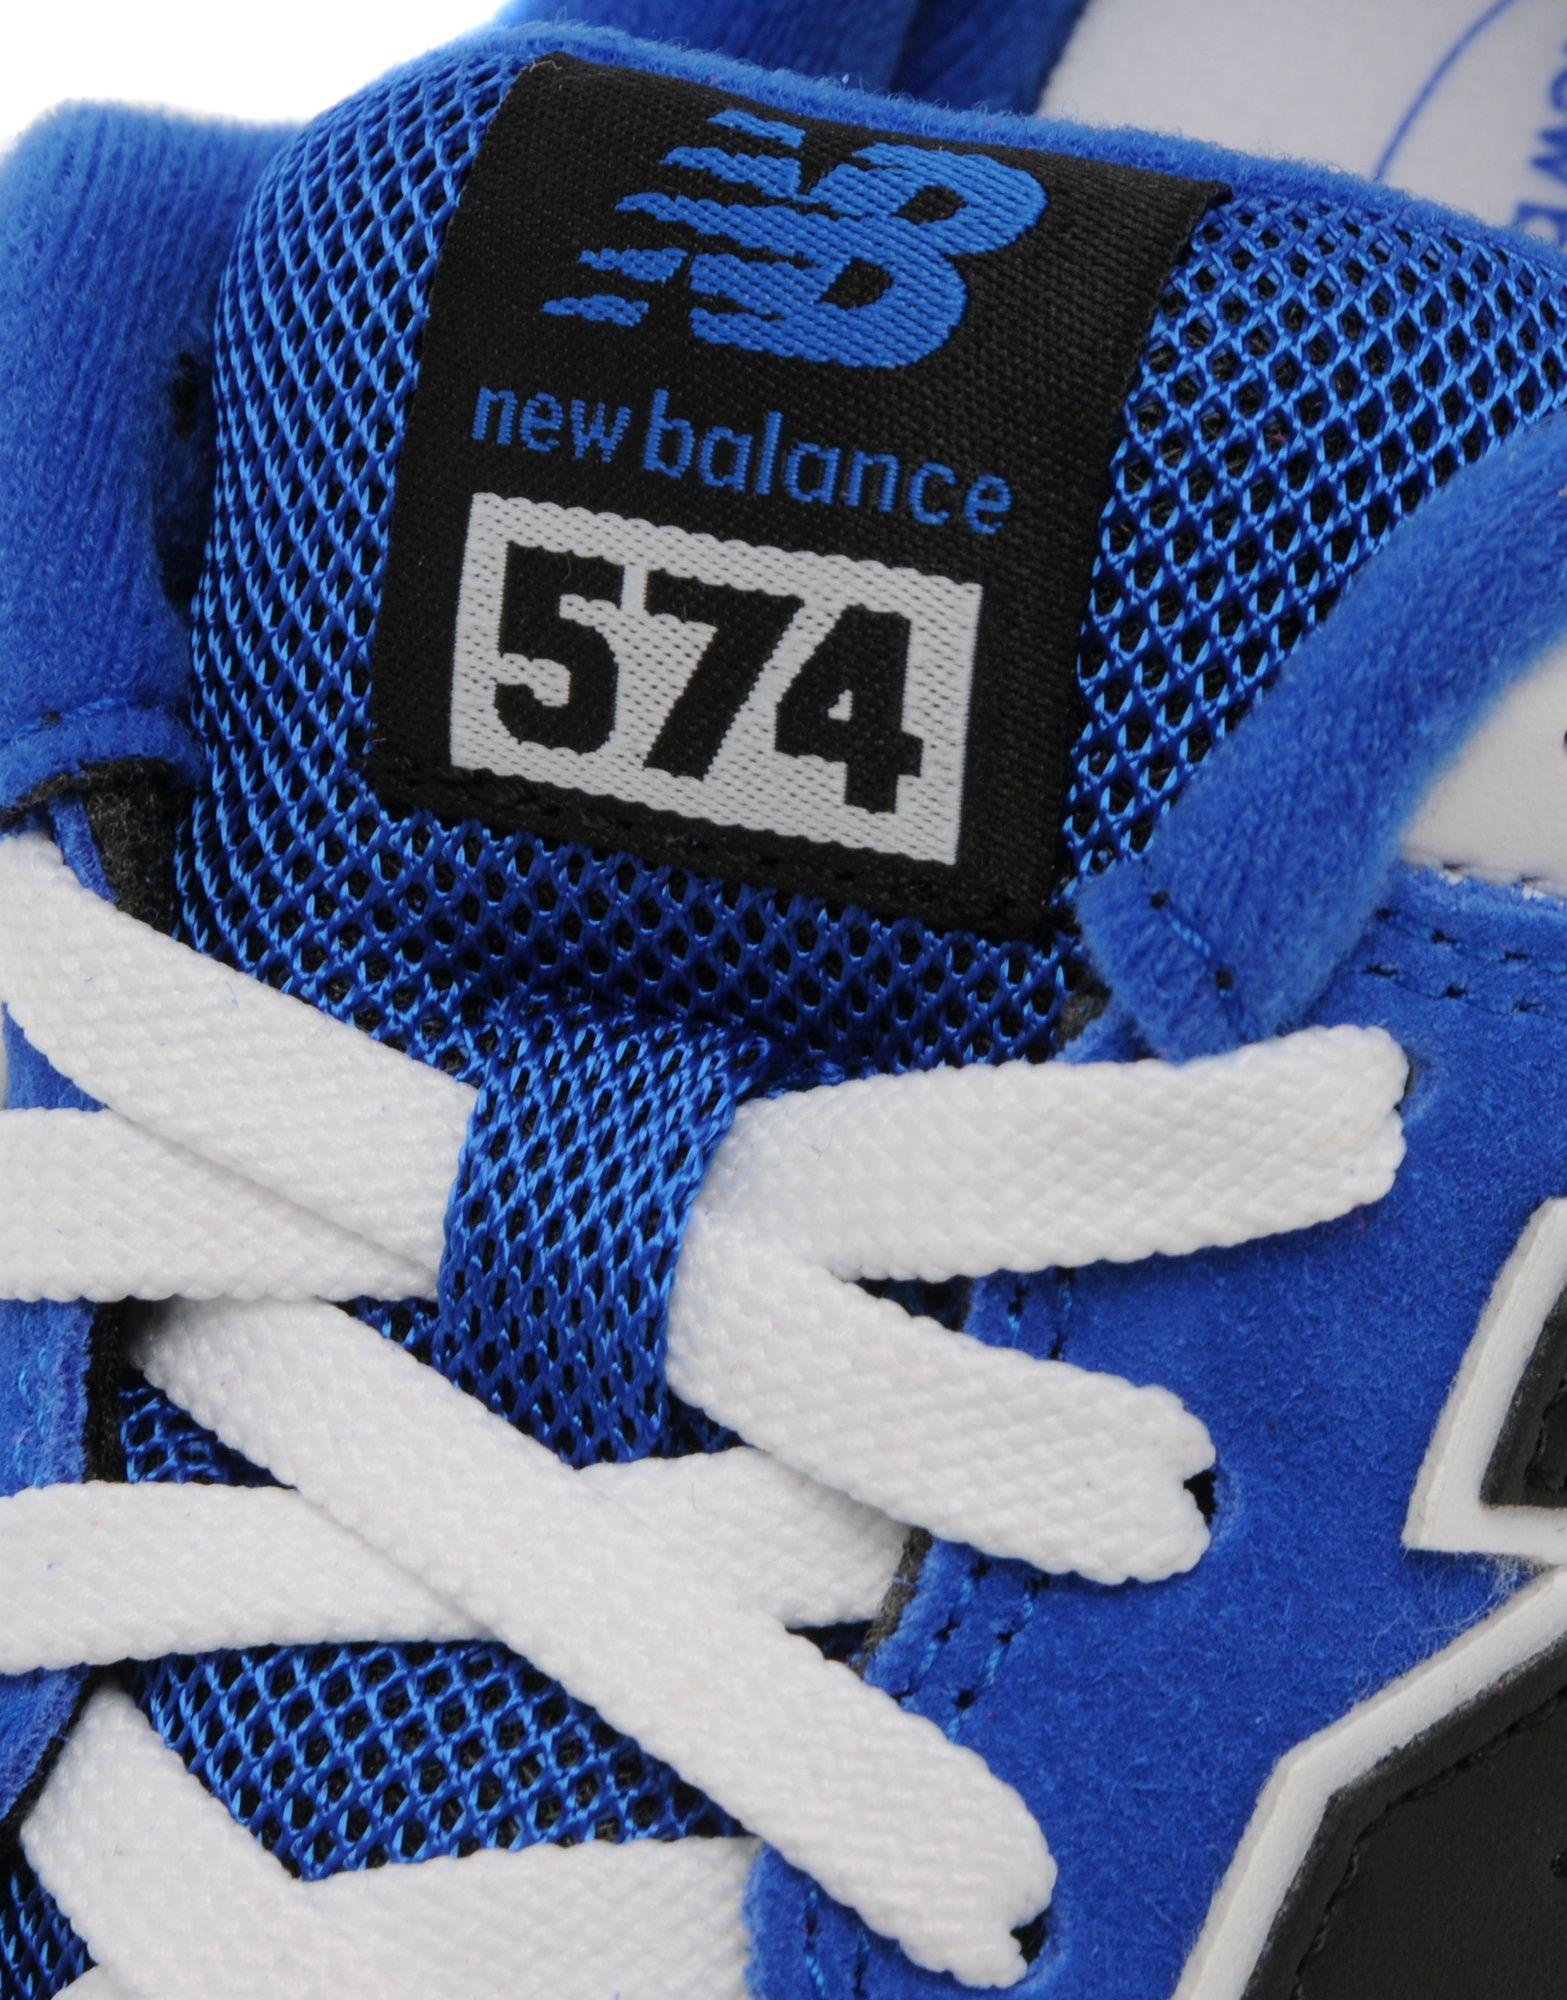 New Balance 574 Childrens